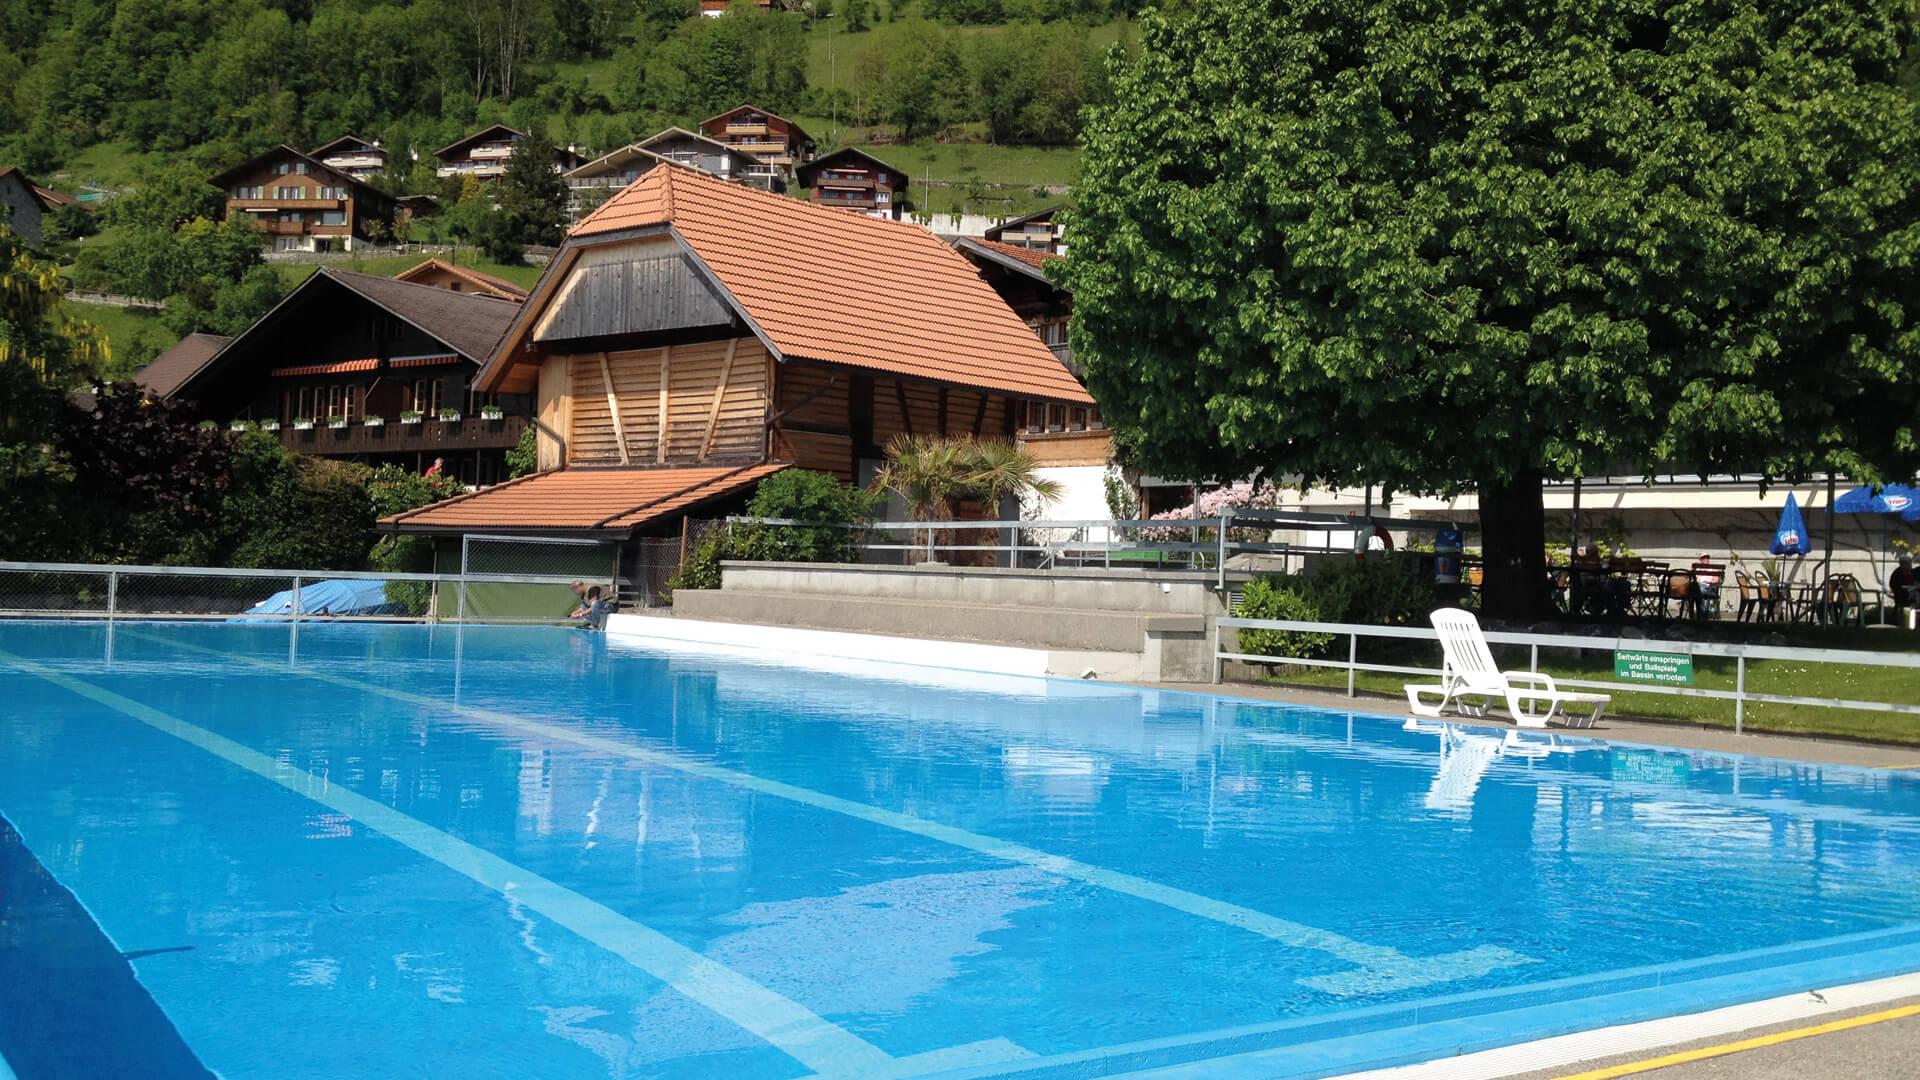 merligen-strandbad-sommer-pool-seelage-baden-thunersee